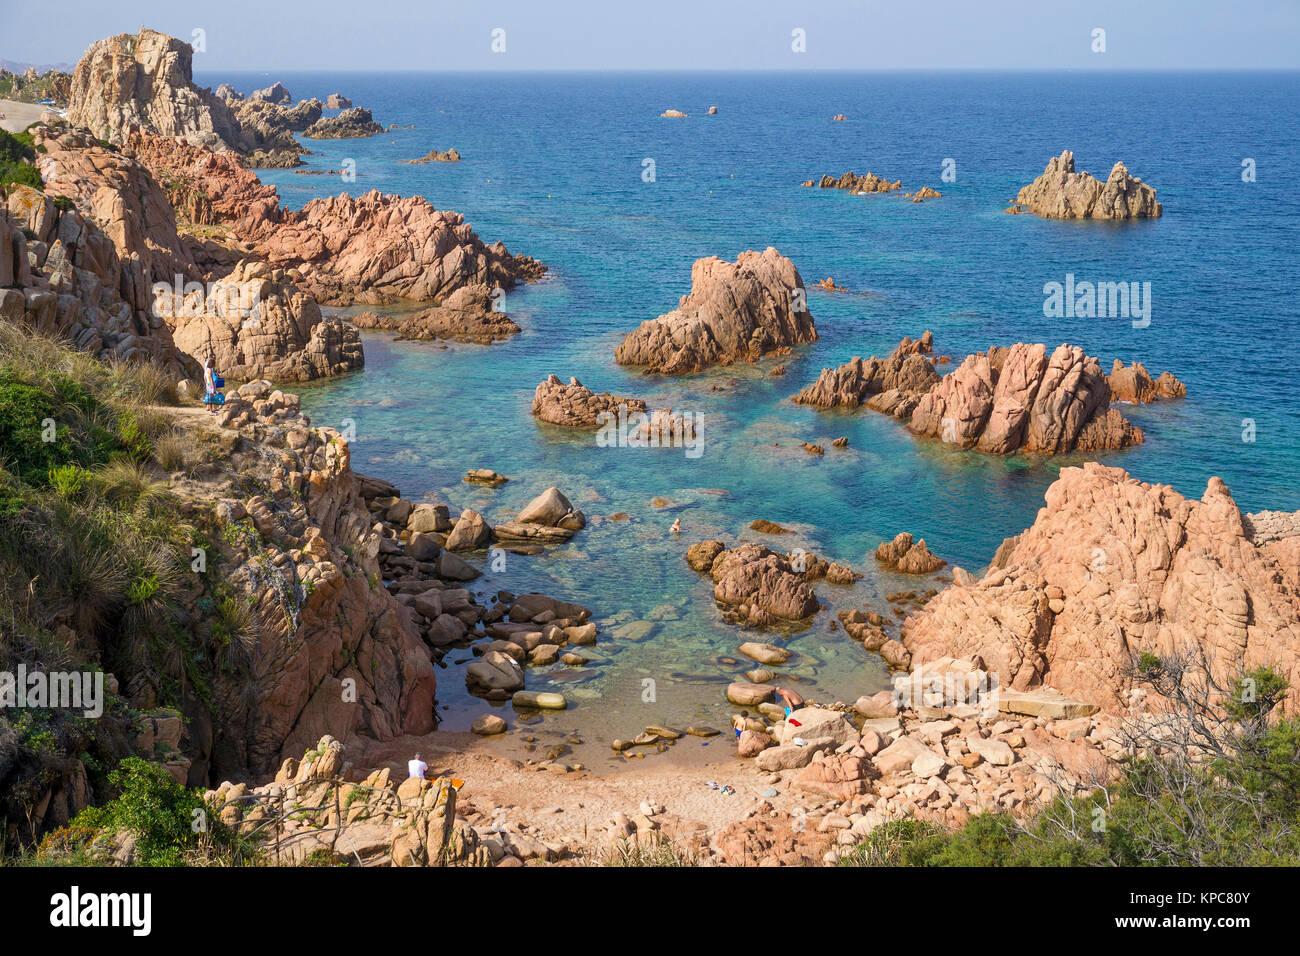 Badestrand an der felsigen Küste von Costa Paradiso, Porphyr Felsen, Sardinien, Italien, Mittelmeer, Europa Stockbild